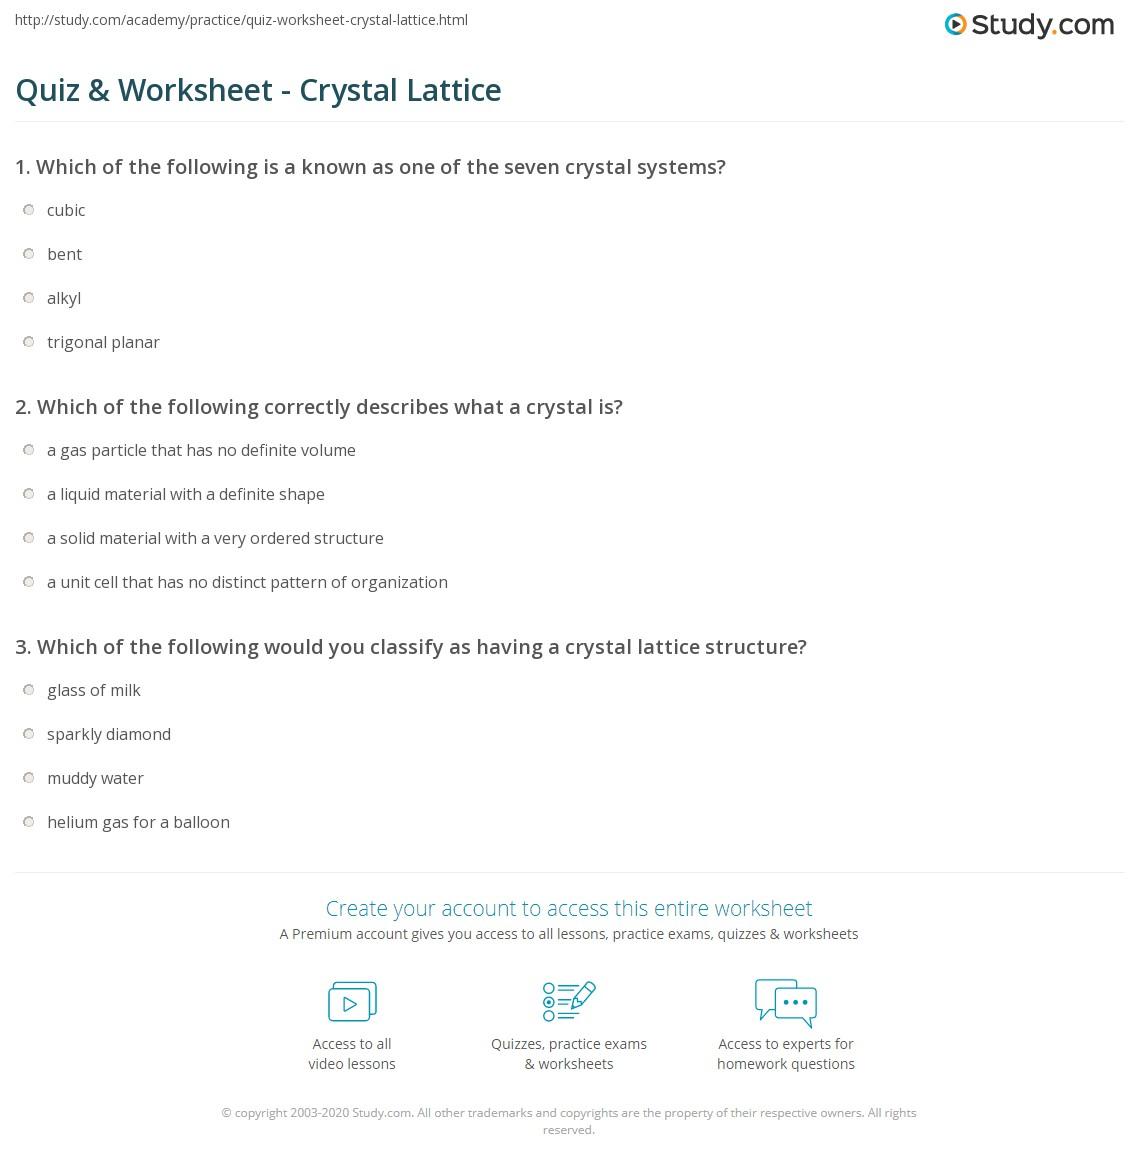 Quiz & Worksheet - Crystal Lattice | Study com